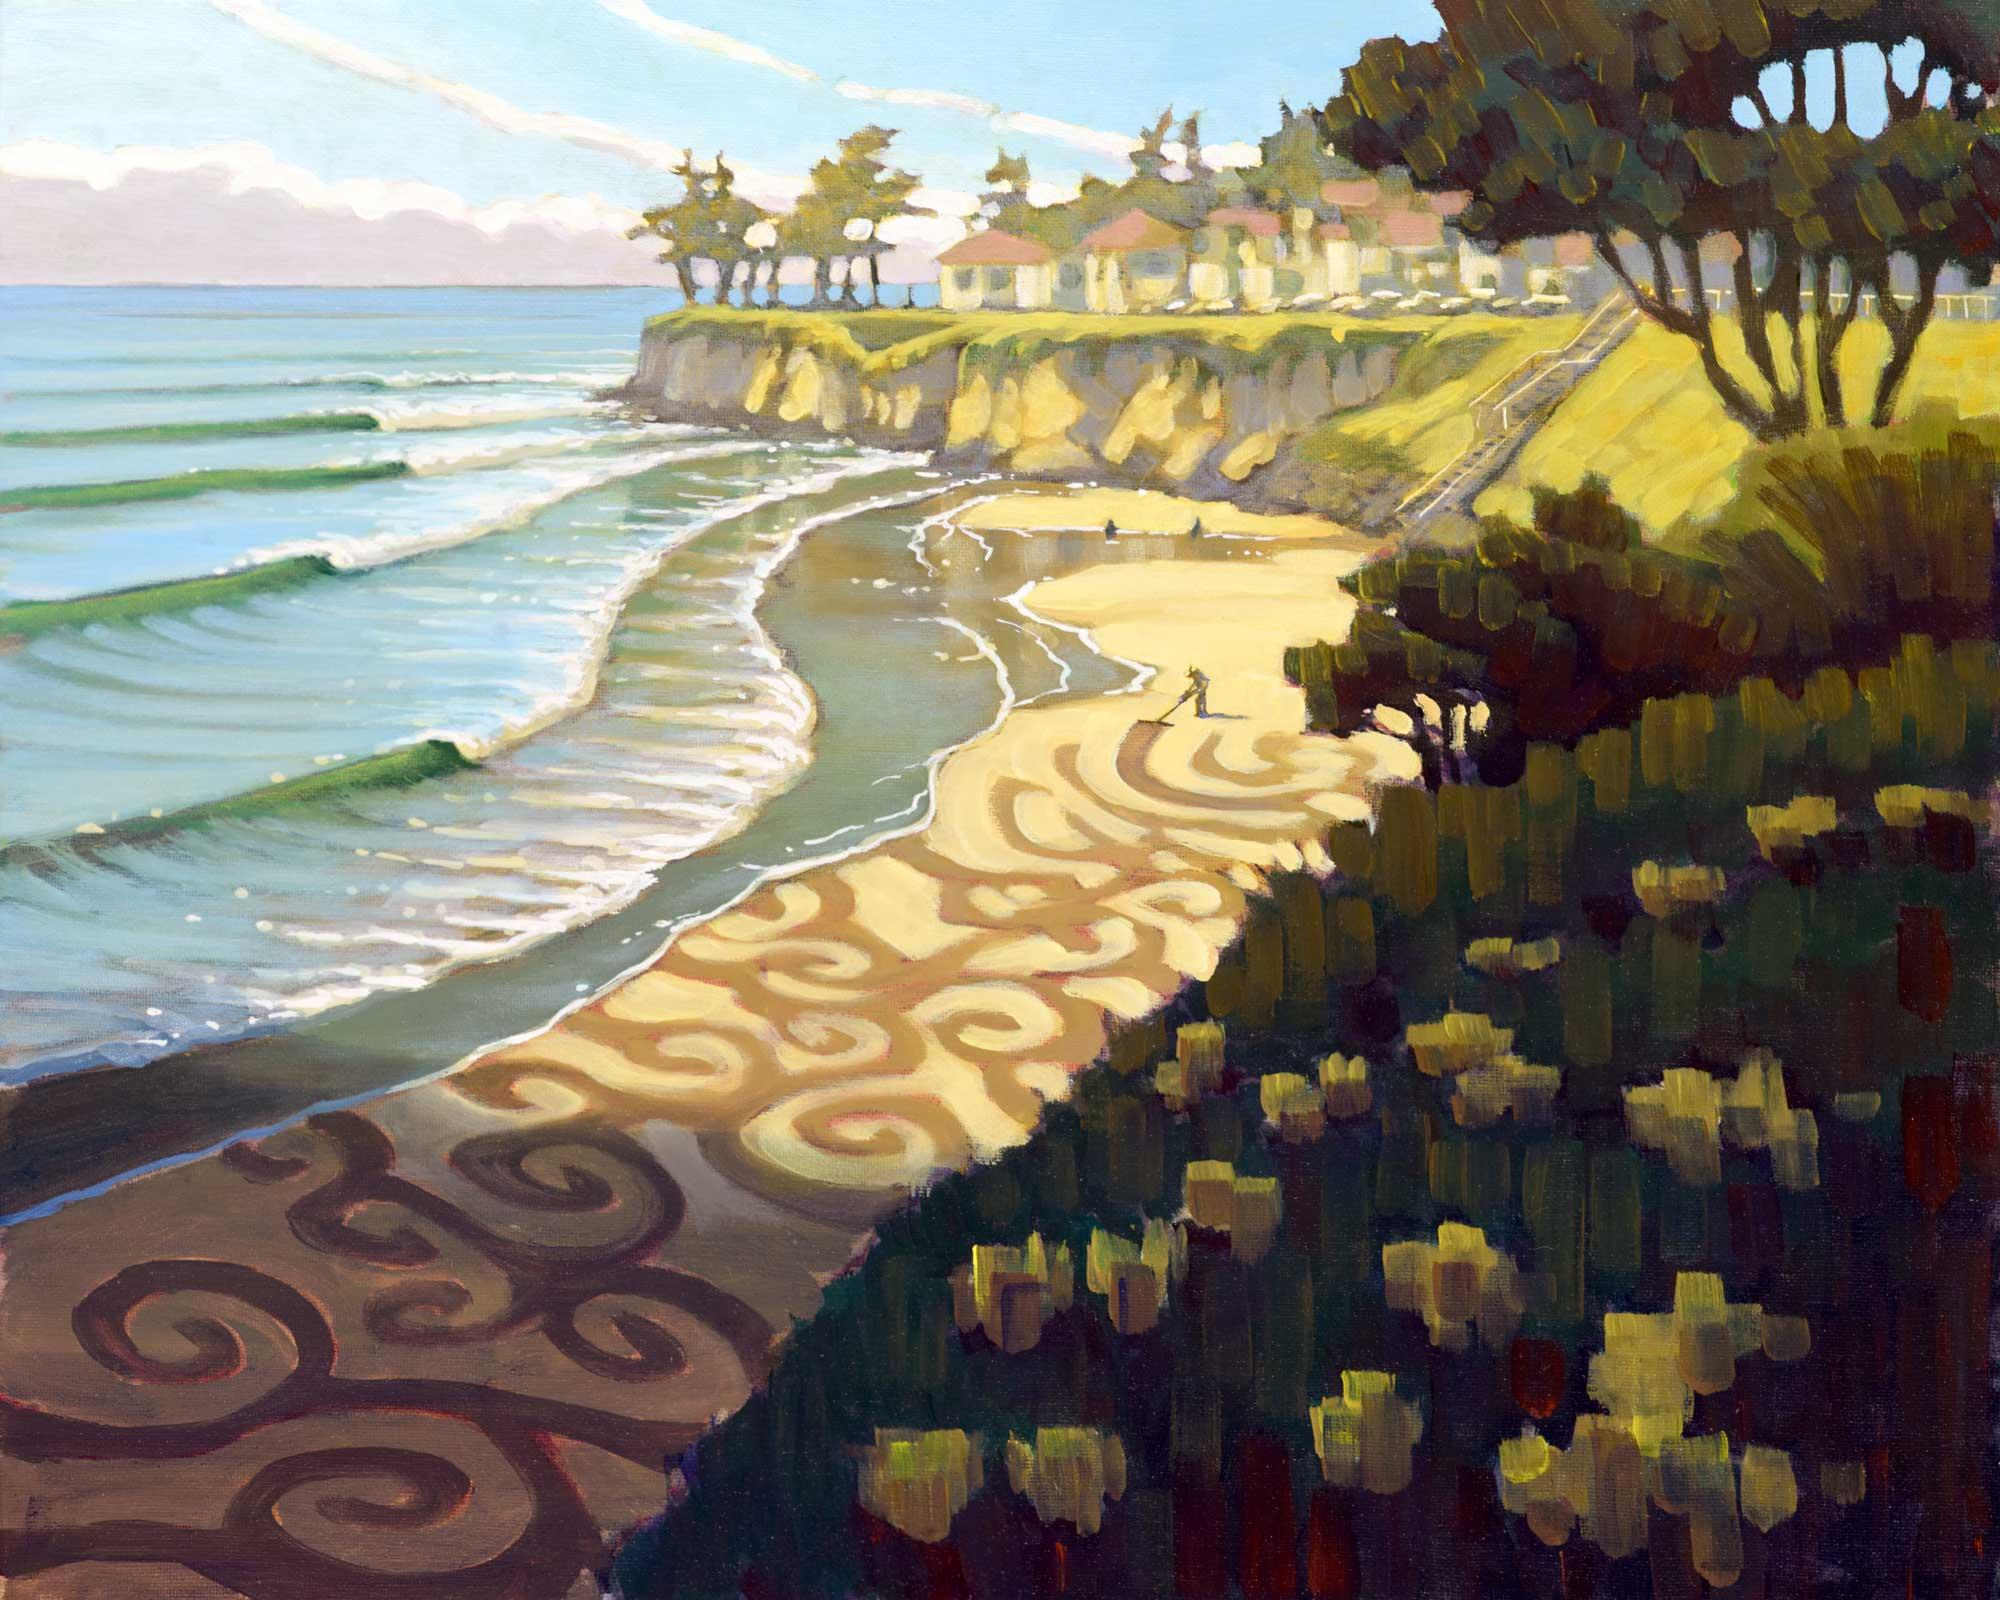 Plein air painting of Jim Devevan creating landworks art at Cowell's Beach on the Santa Cruz coast of California